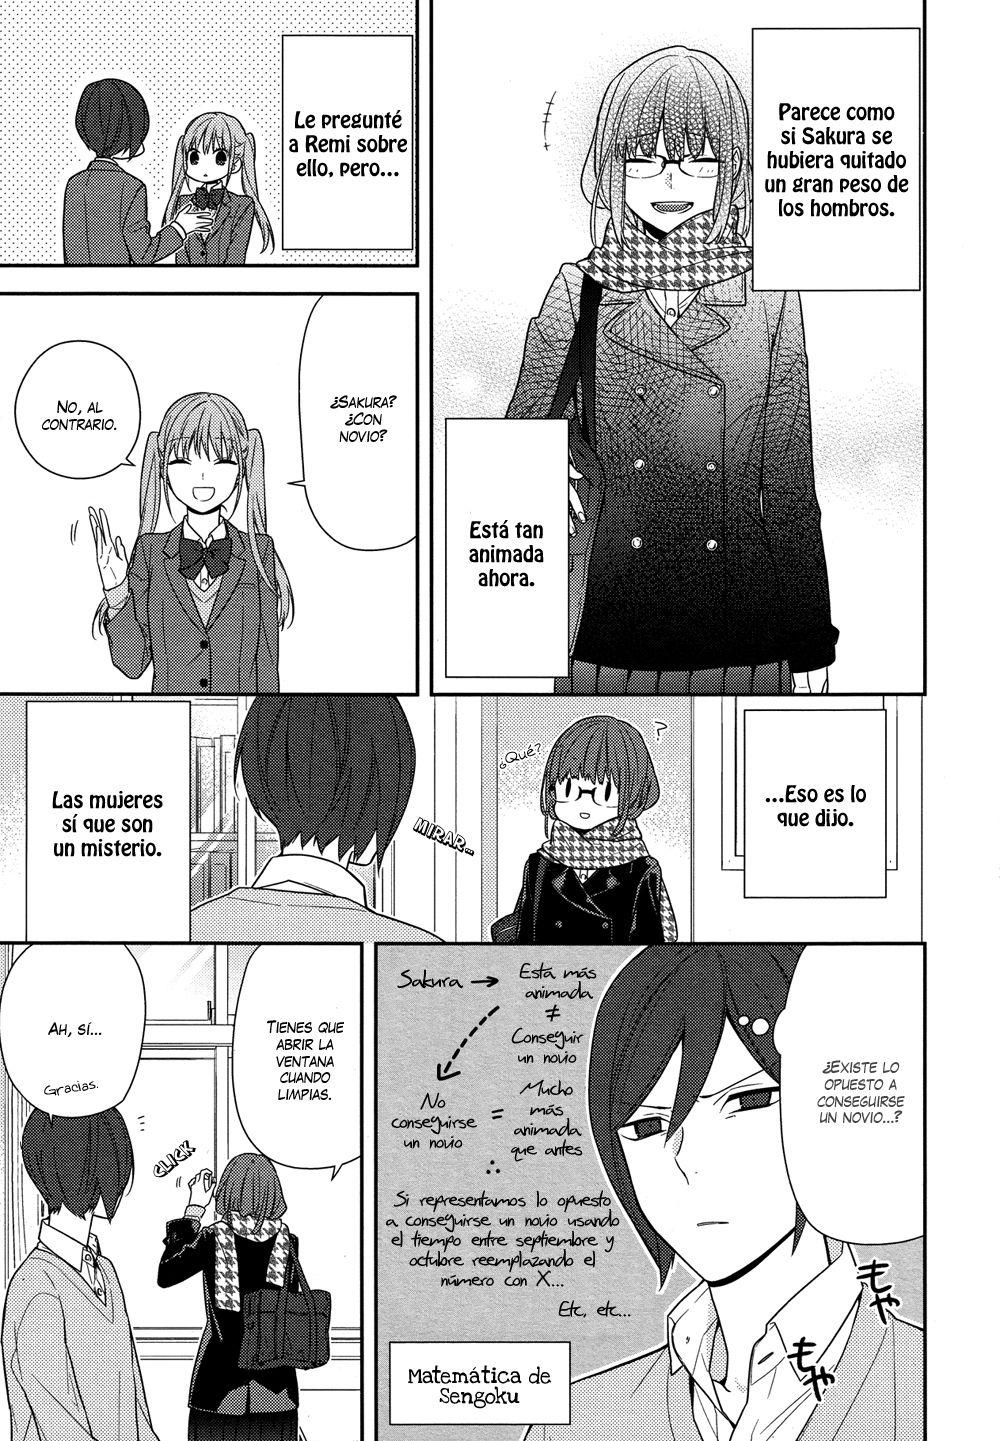 http://c5.ninemanga.com/es_manga/19/1043/453413/2ec937378ea08e49faa1a6608880d002.jpg Page 5